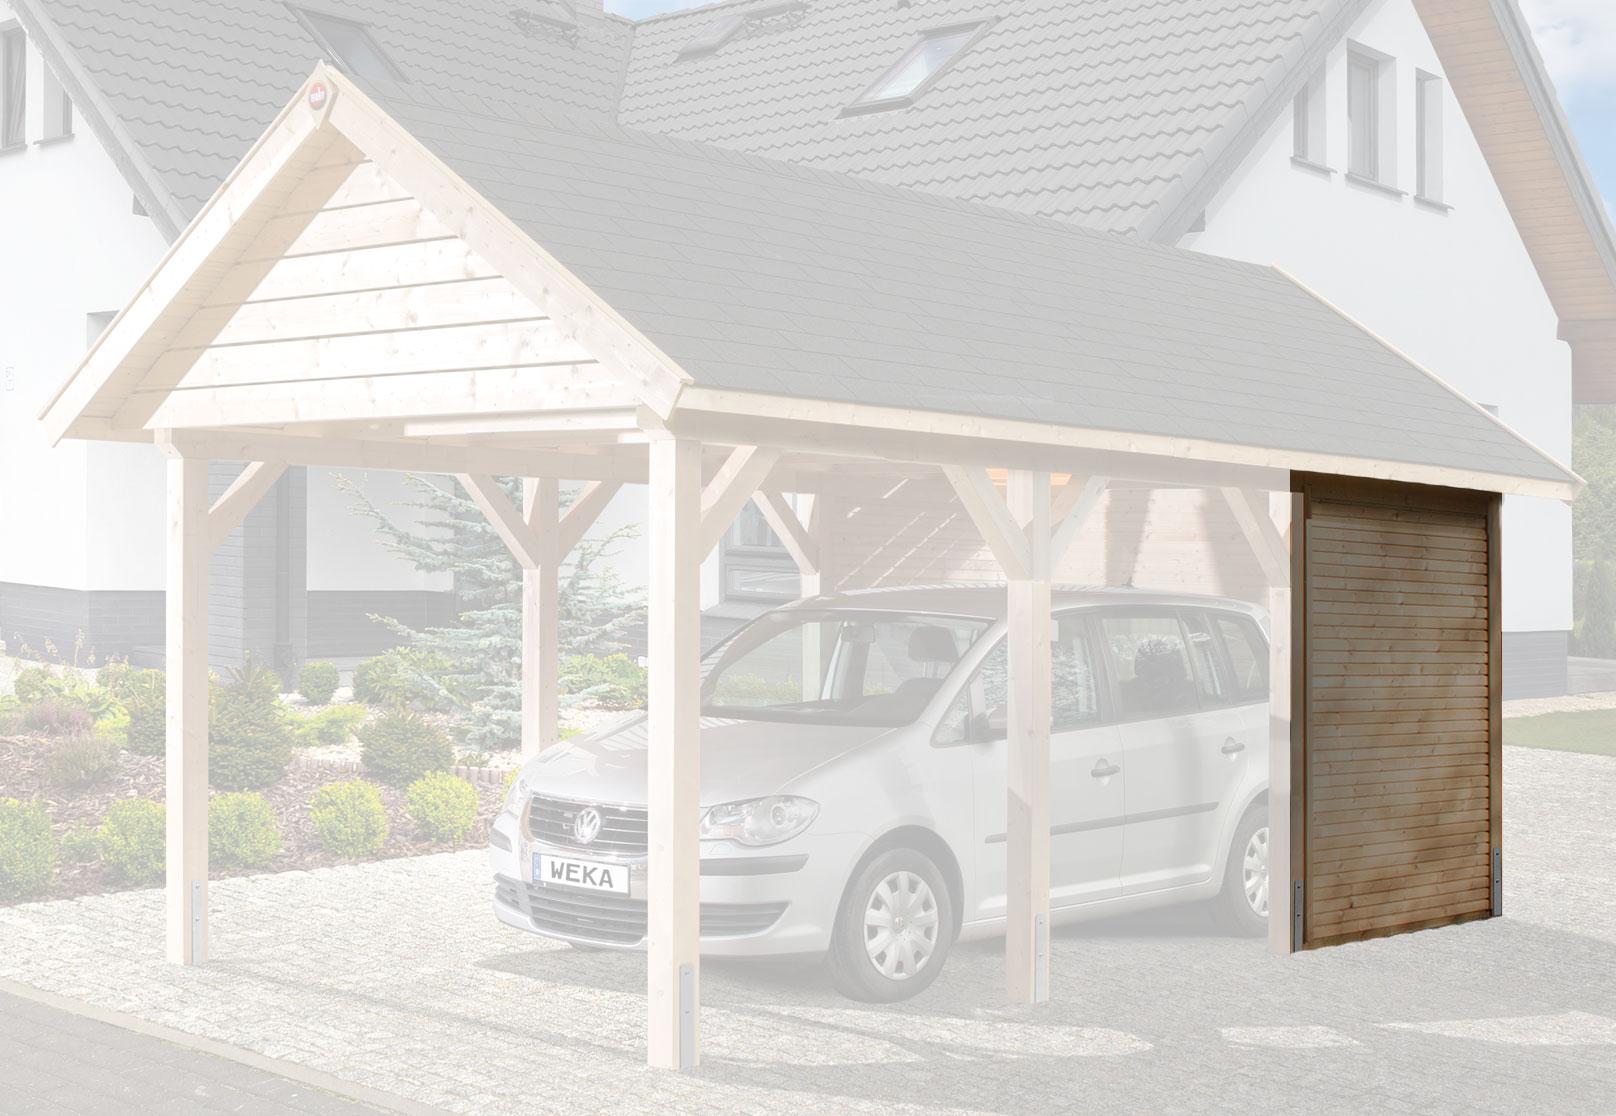 seitenwand weka carport leimholz flachdach satteldach. Black Bedroom Furniture Sets. Home Design Ideas